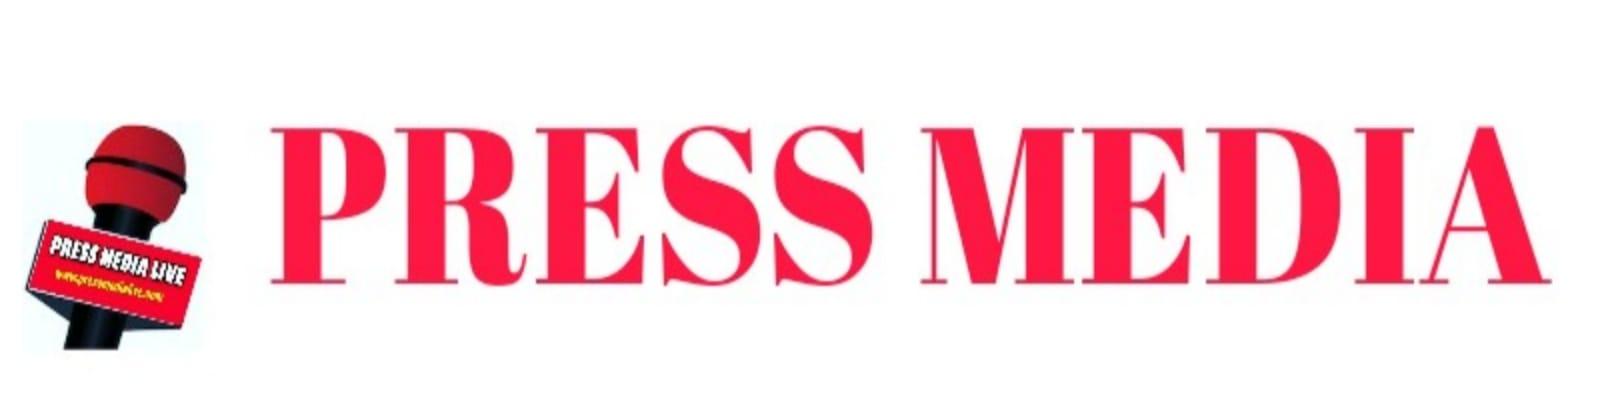 PRESS MEDIA LIVE